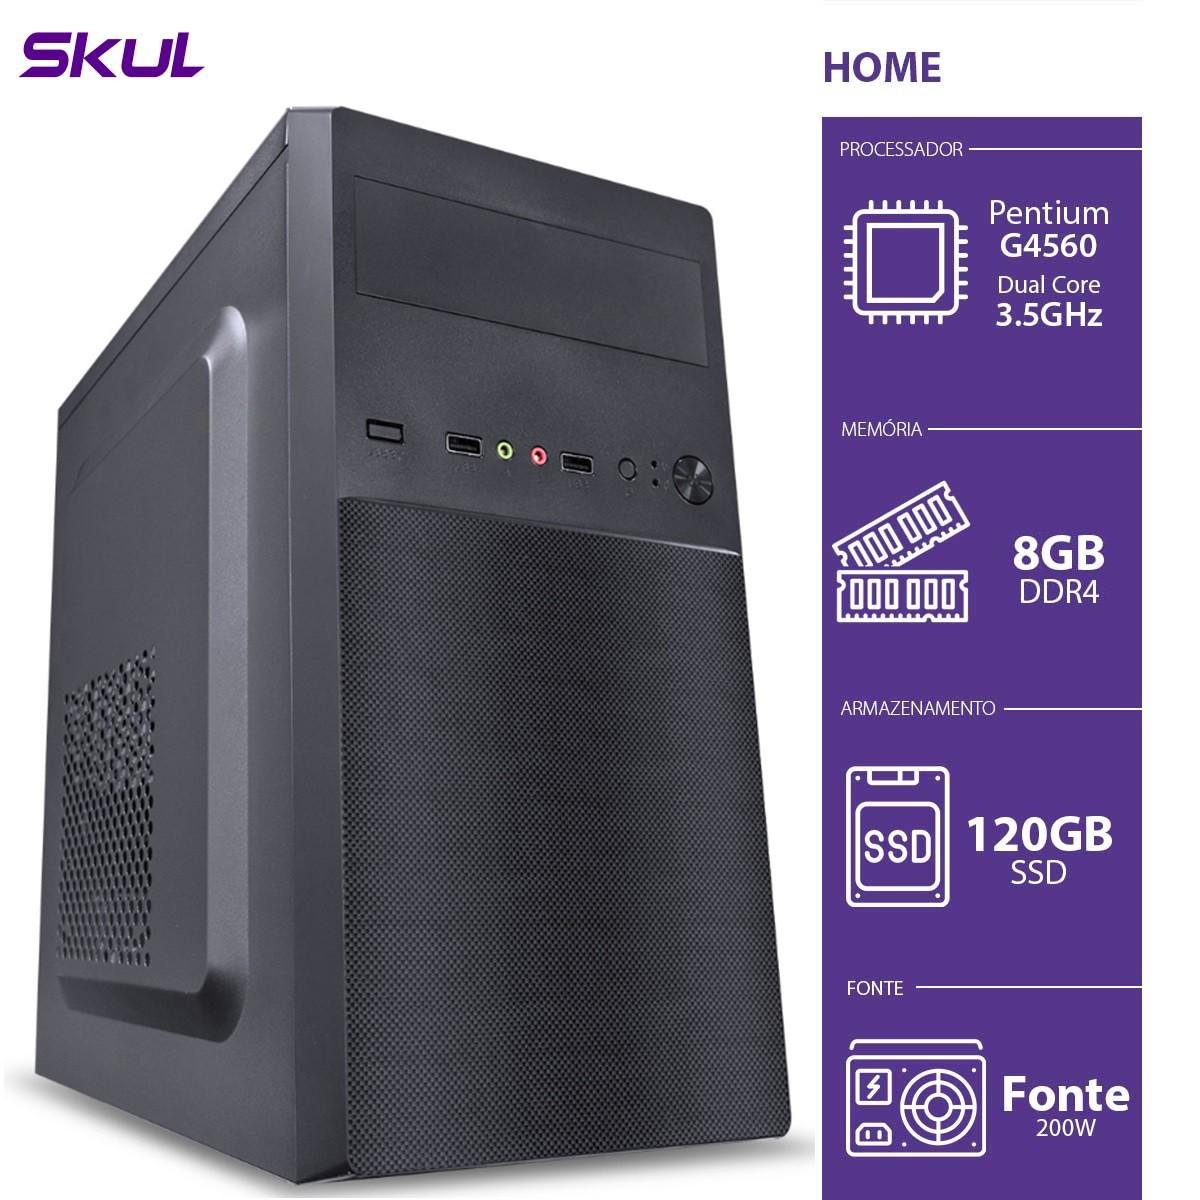 Computador Home H200 - Pentium Dual Core G4560 3.5GHZ 8GB DDR4 SSD 120GB HDMI/VGA Fonte 200W